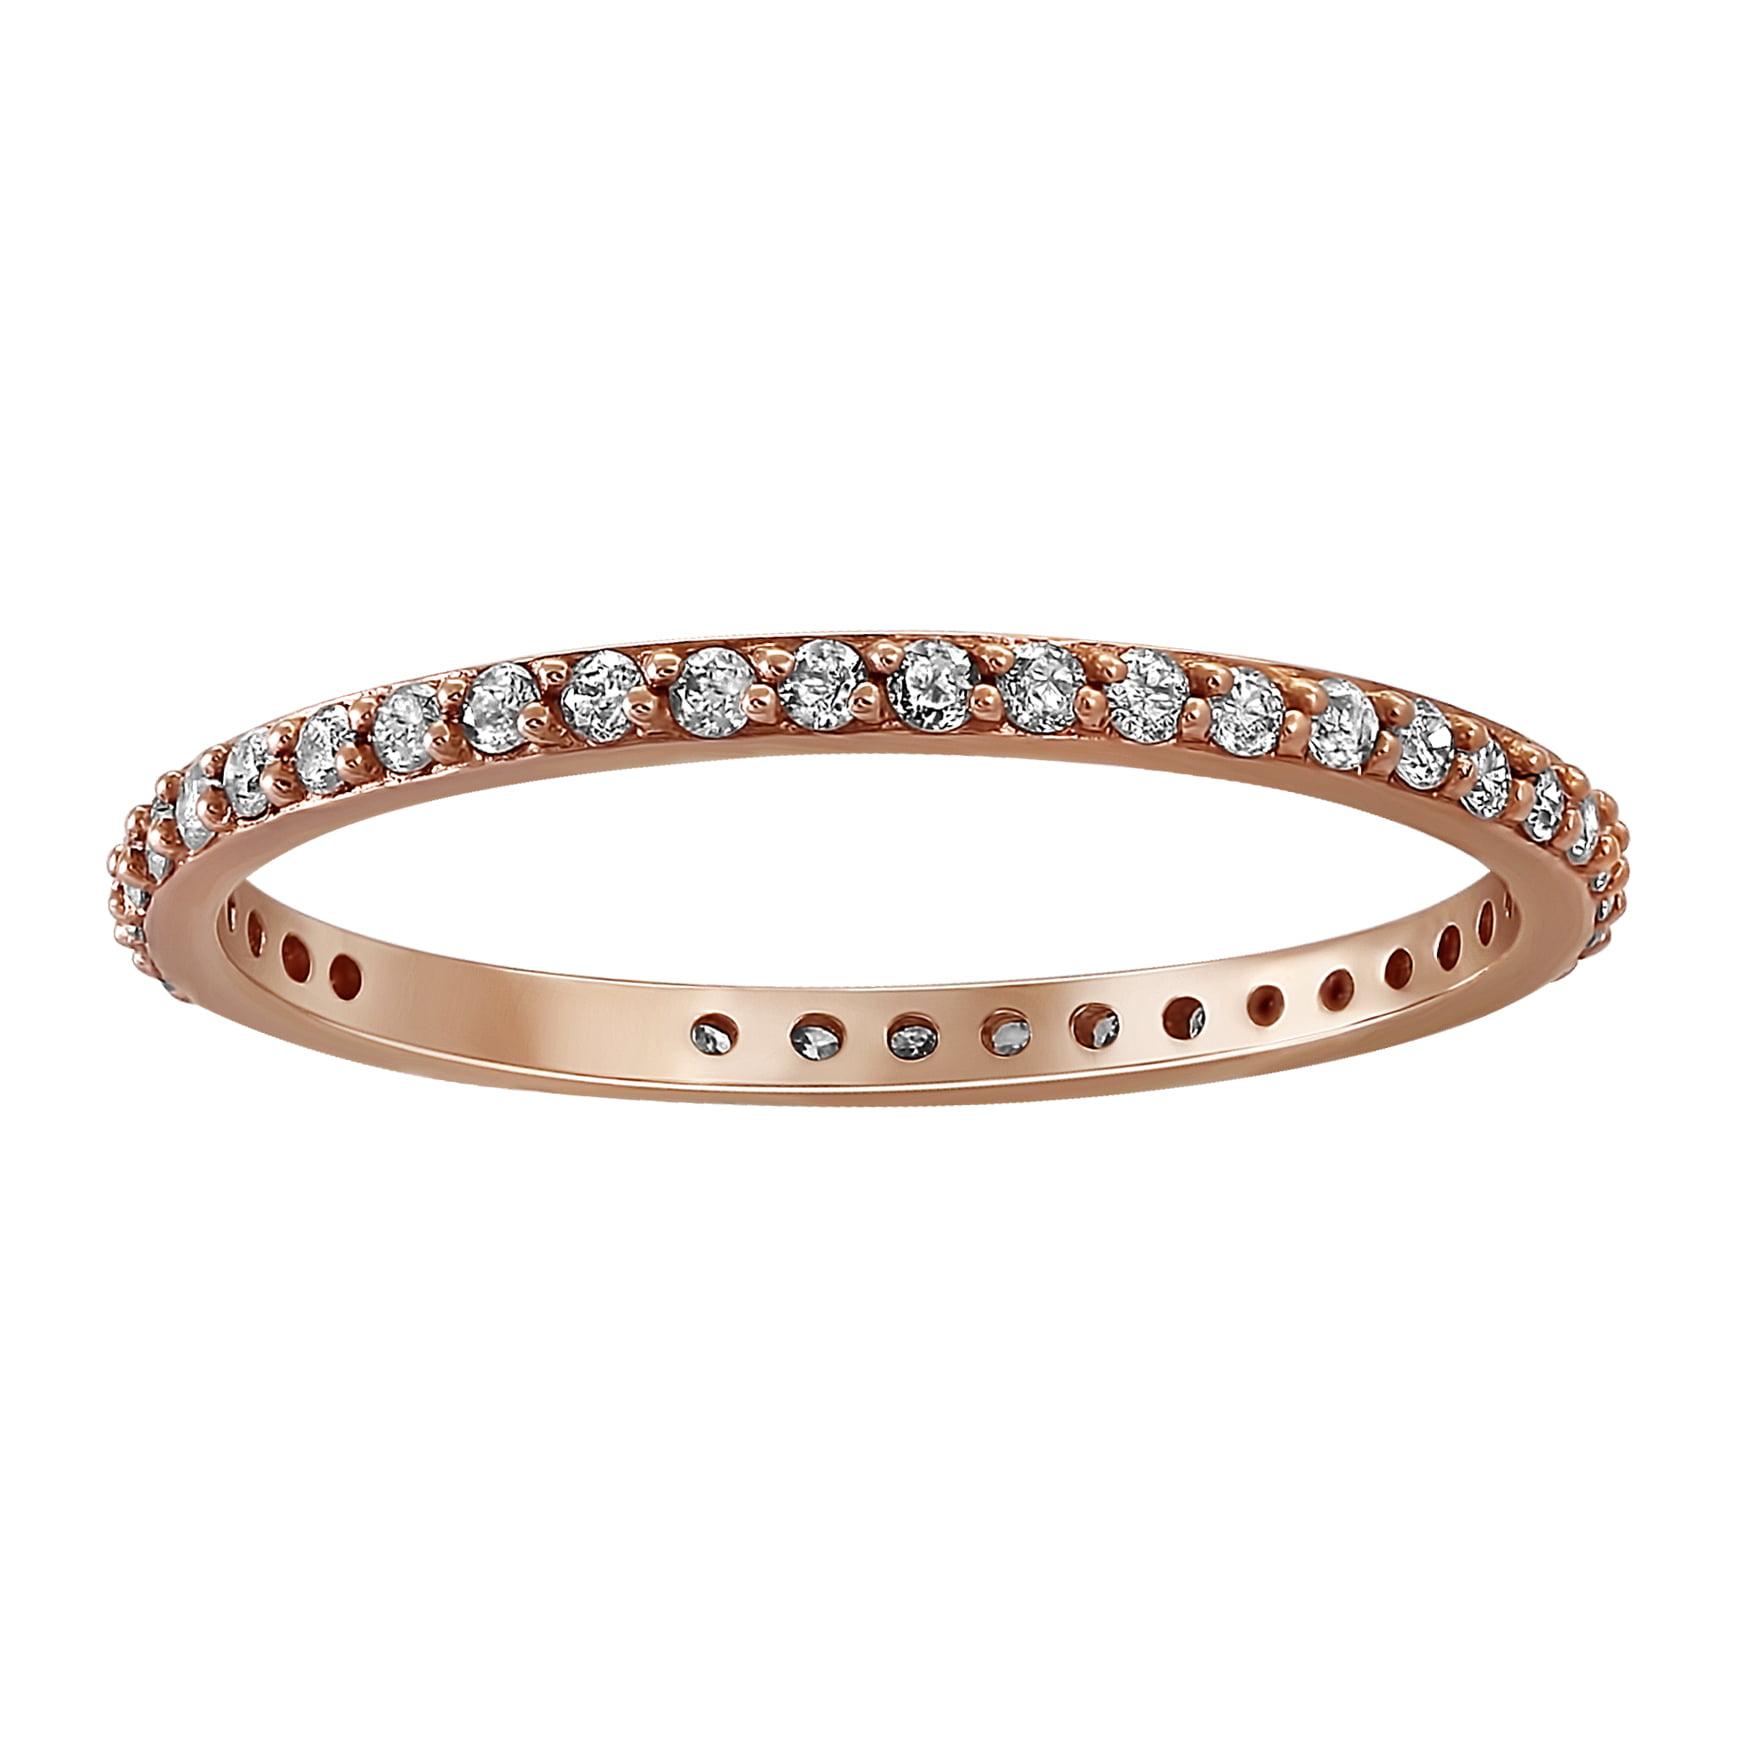 1/3 carat Diamond Eternity Band Ring in 14K Pink Gold